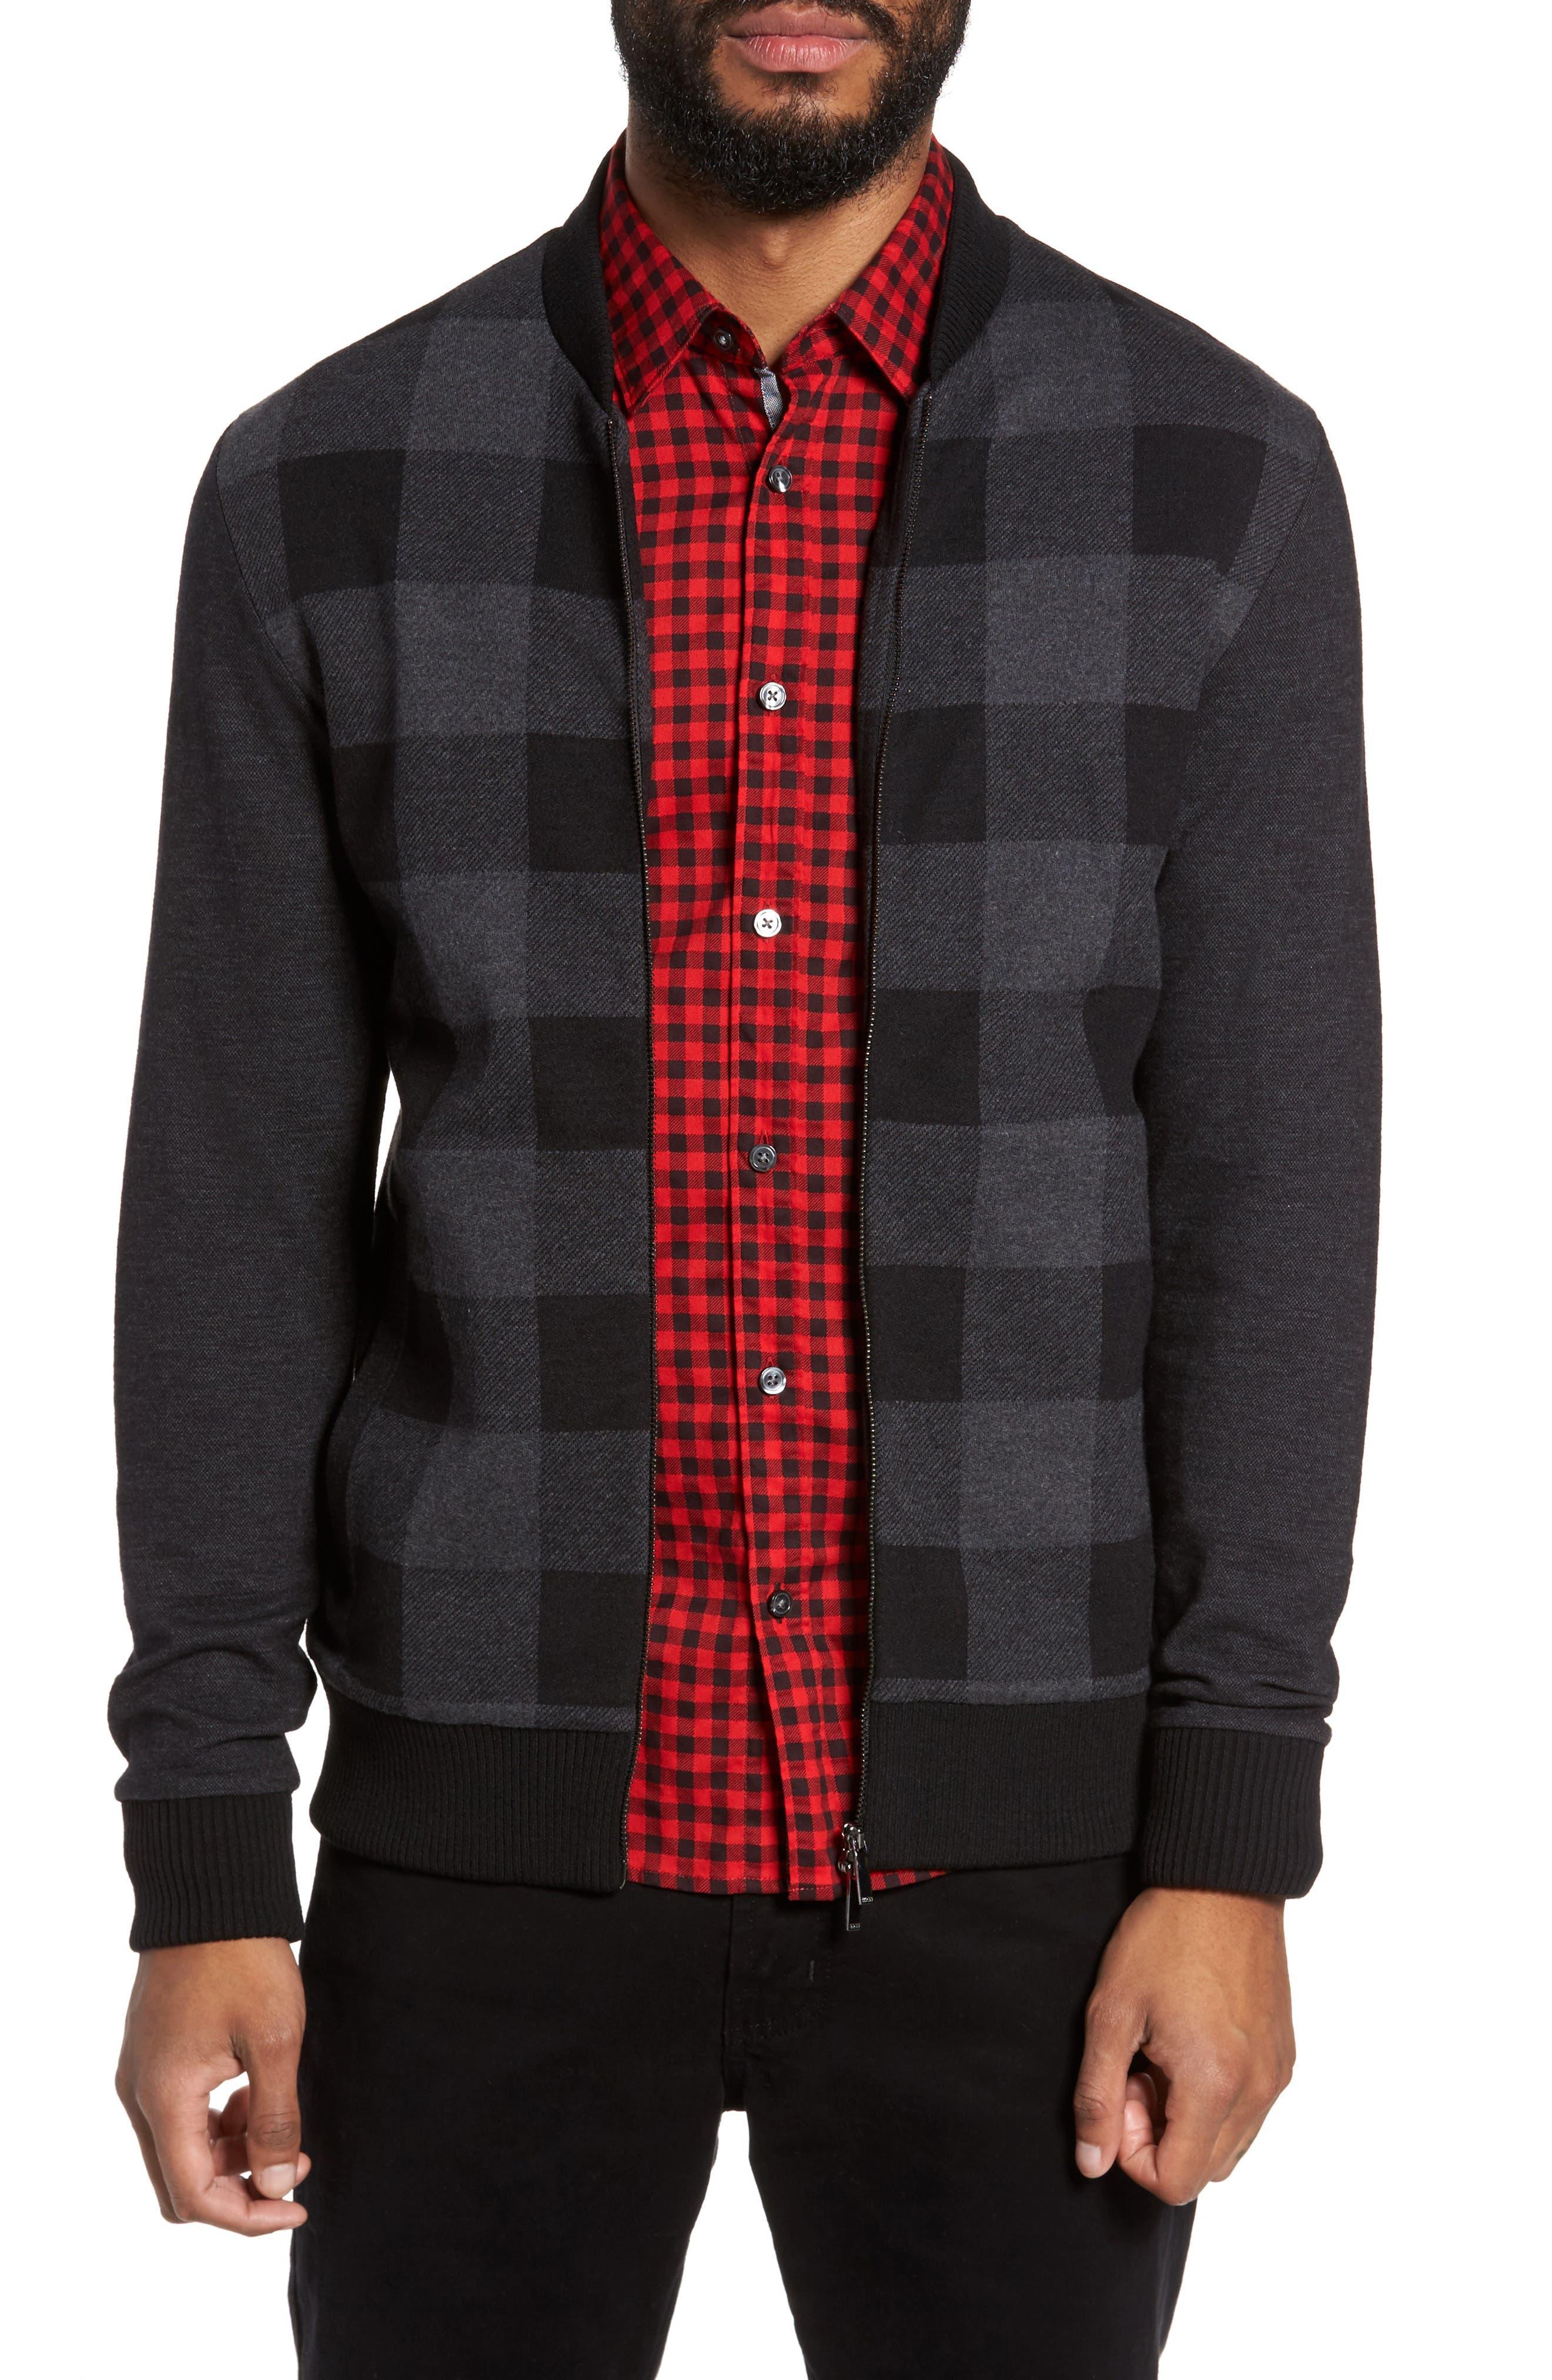 Salea Check Wool Blend Bomber Jacket,                             Main thumbnail 1, color,                             001